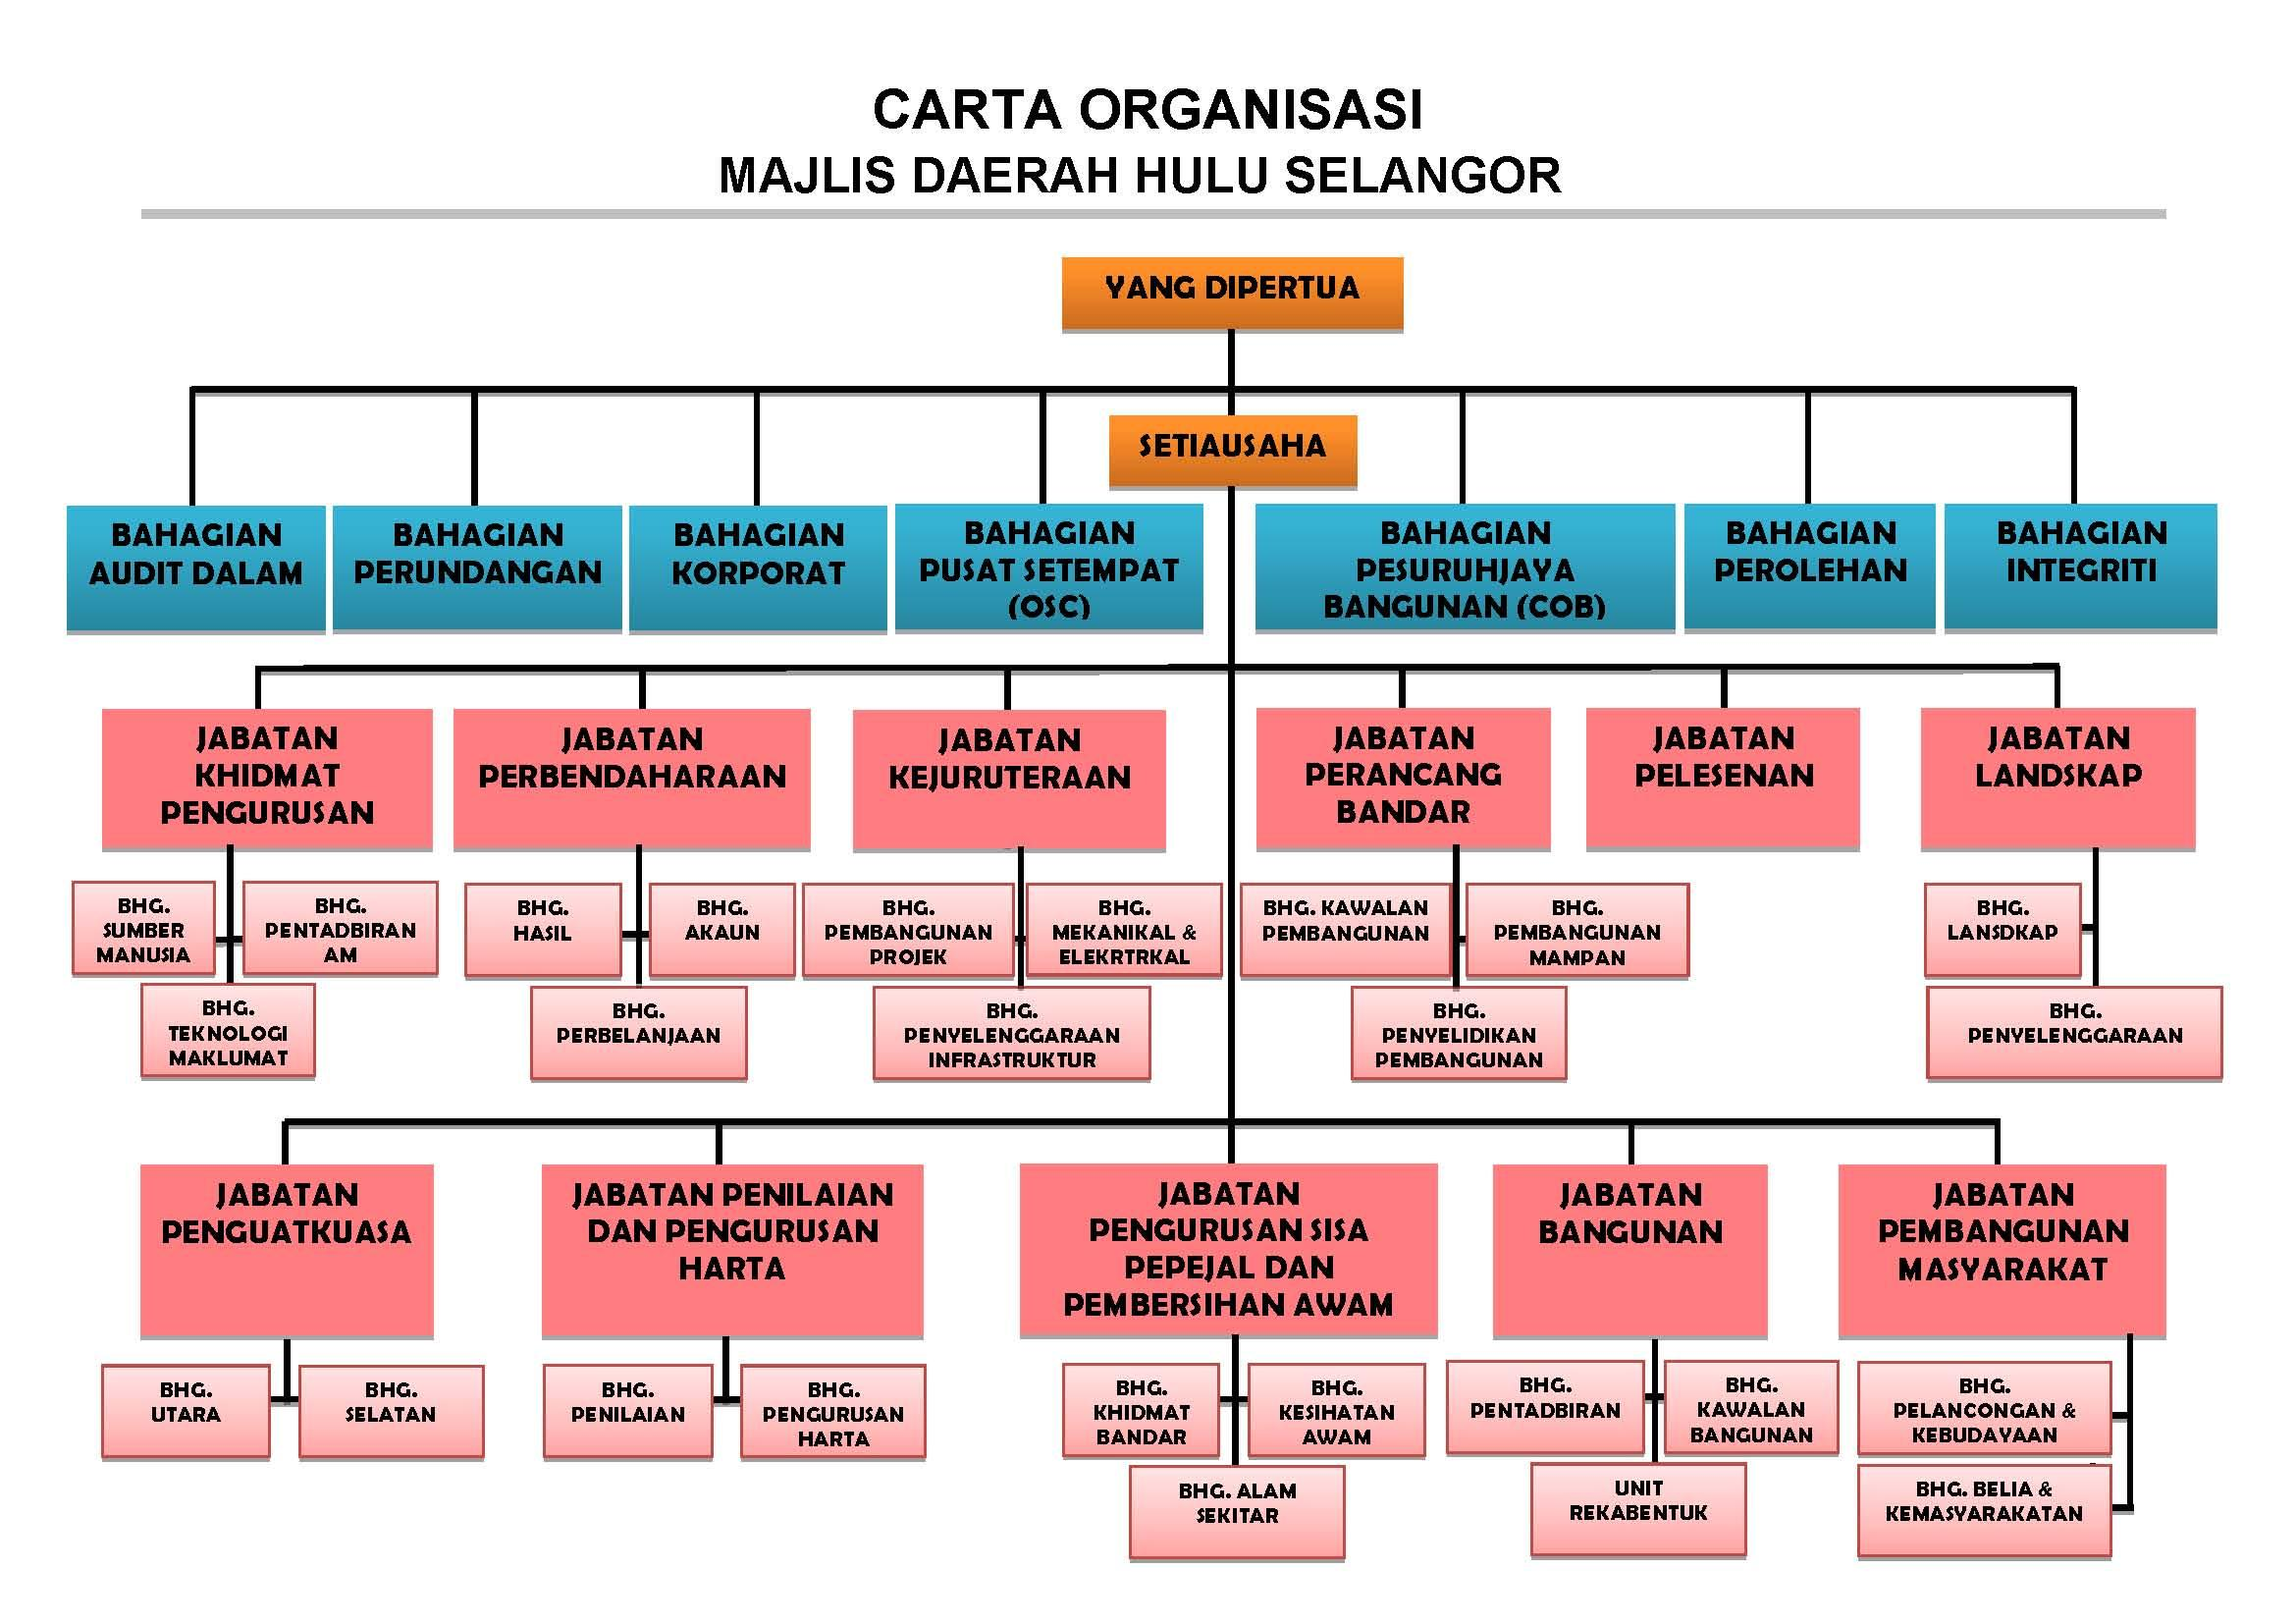 carta organisasi MDHS